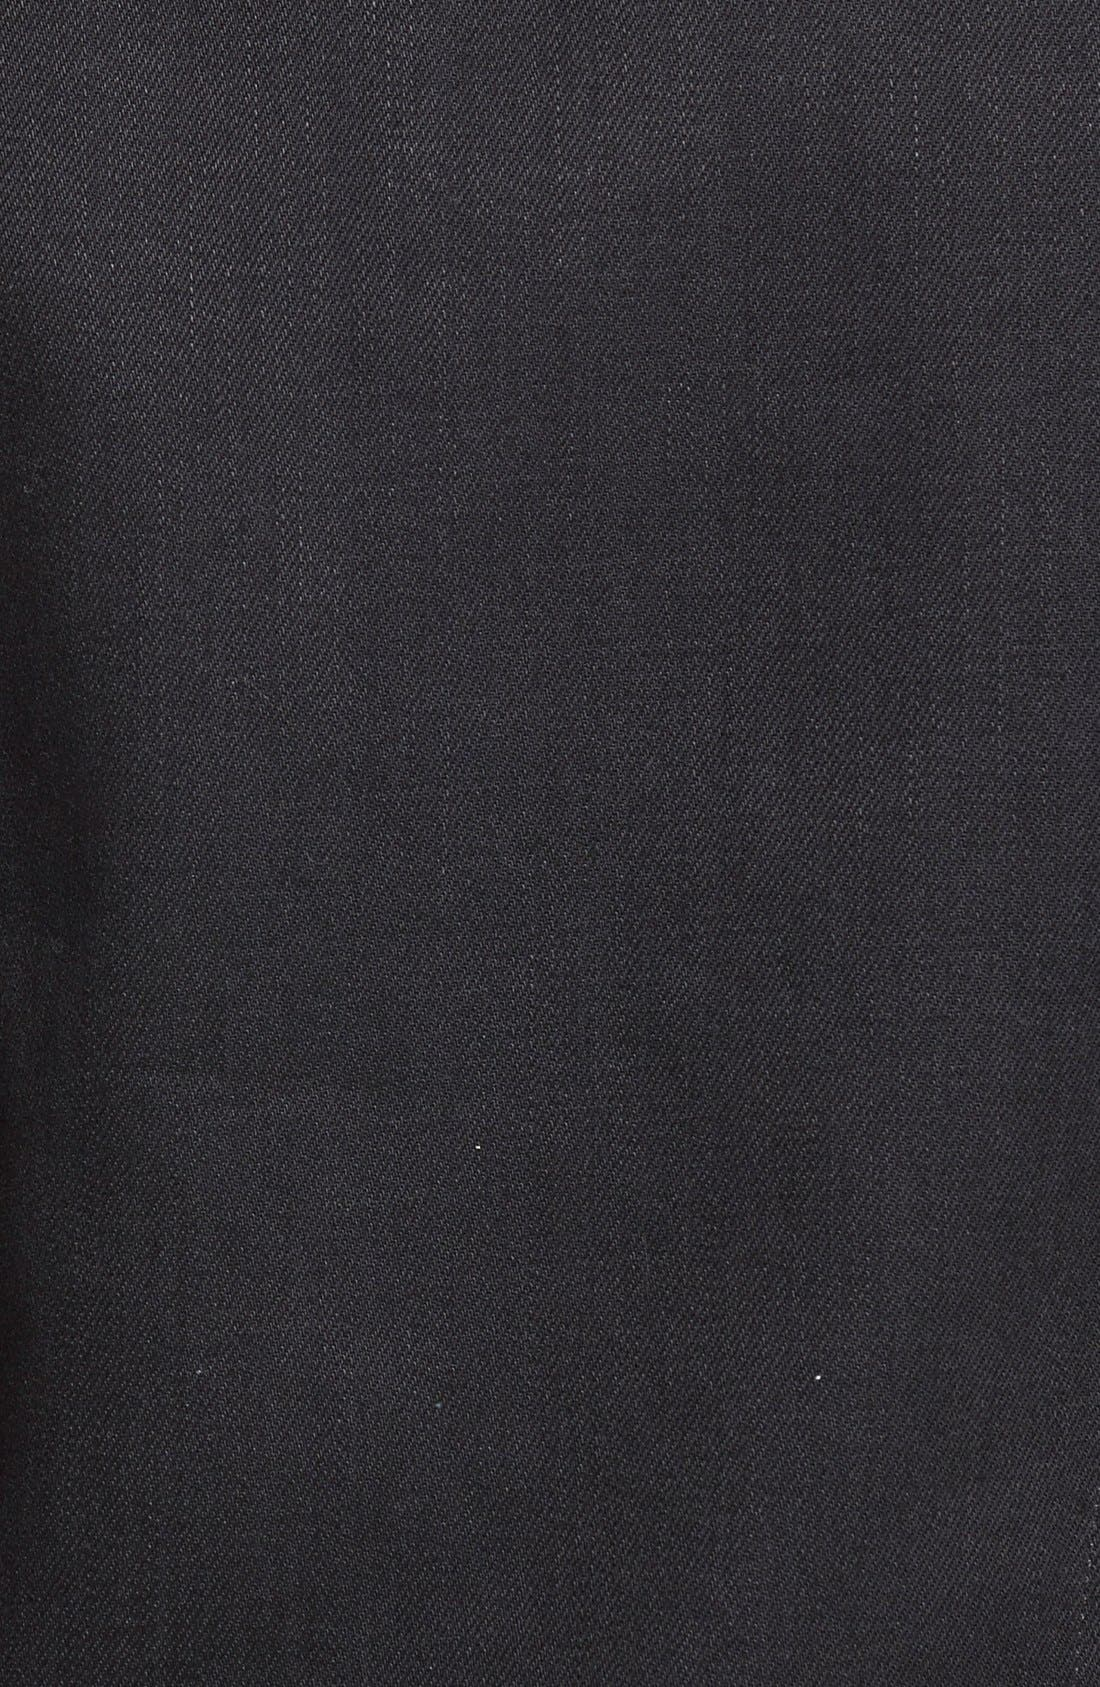 BURBERRY, Brit 'Skipper' Trim Fit Denim Jacket with Leather Collar, Alternate thumbnail 2, color, 001